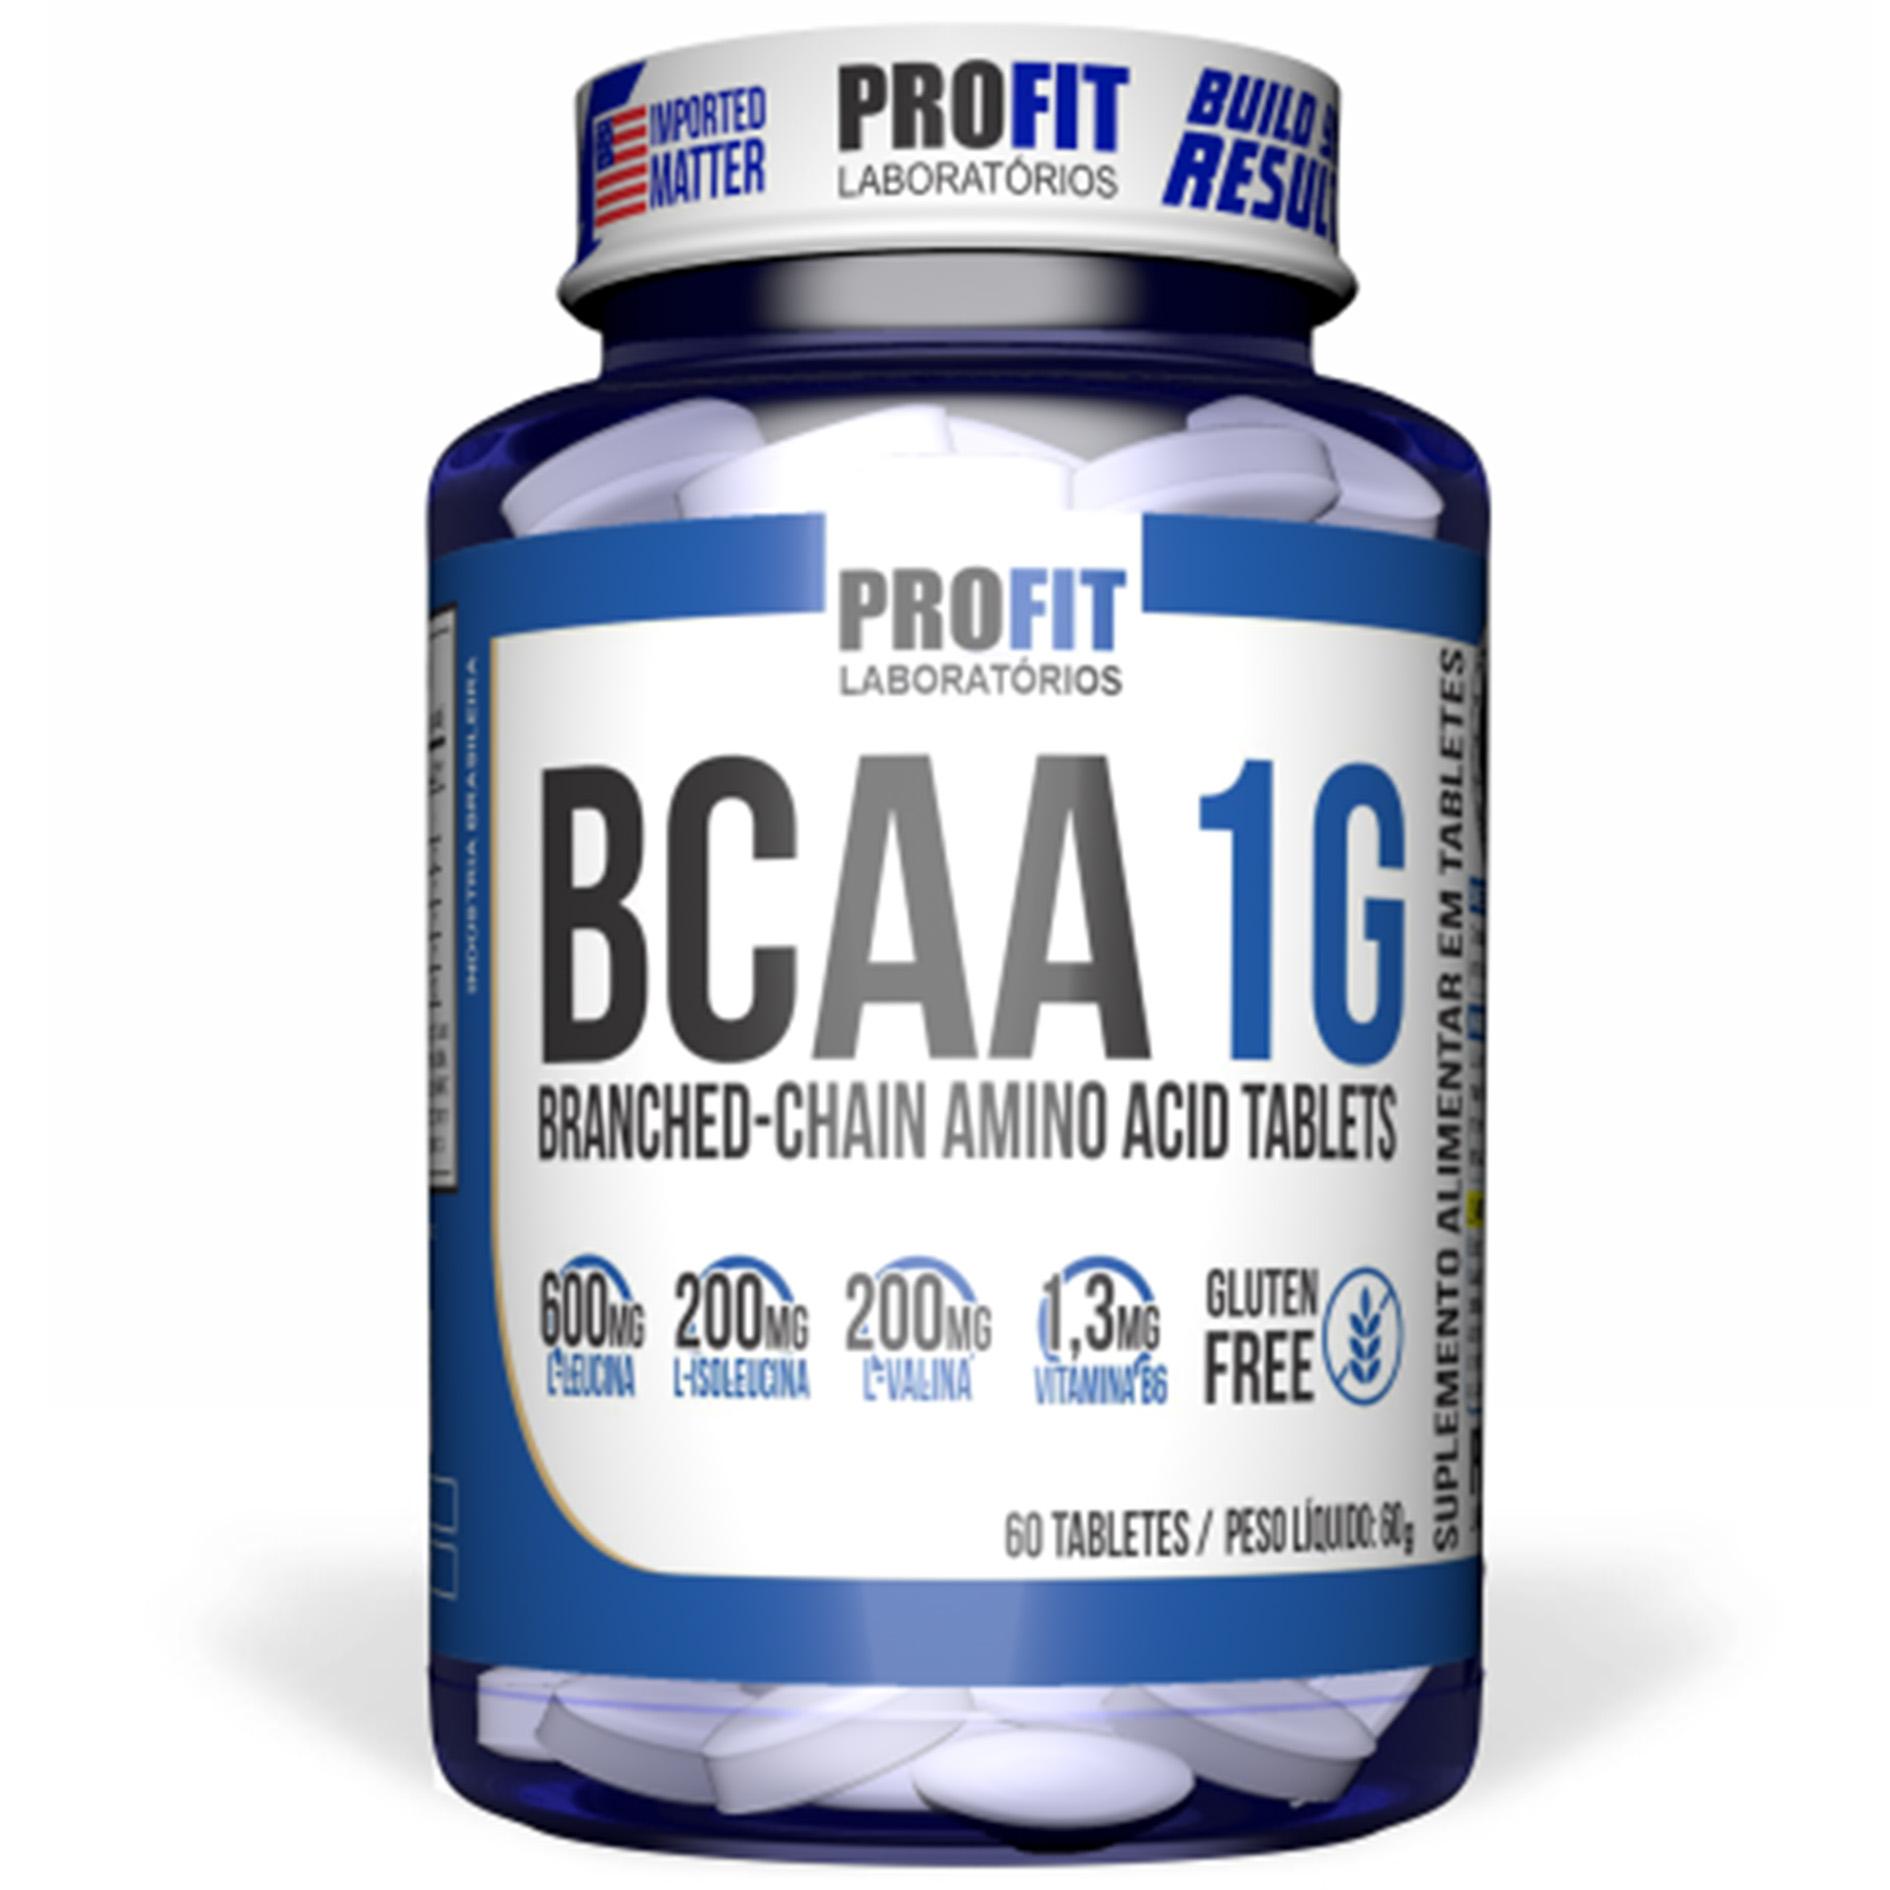 BCAA 1G Profit - 60 Tab